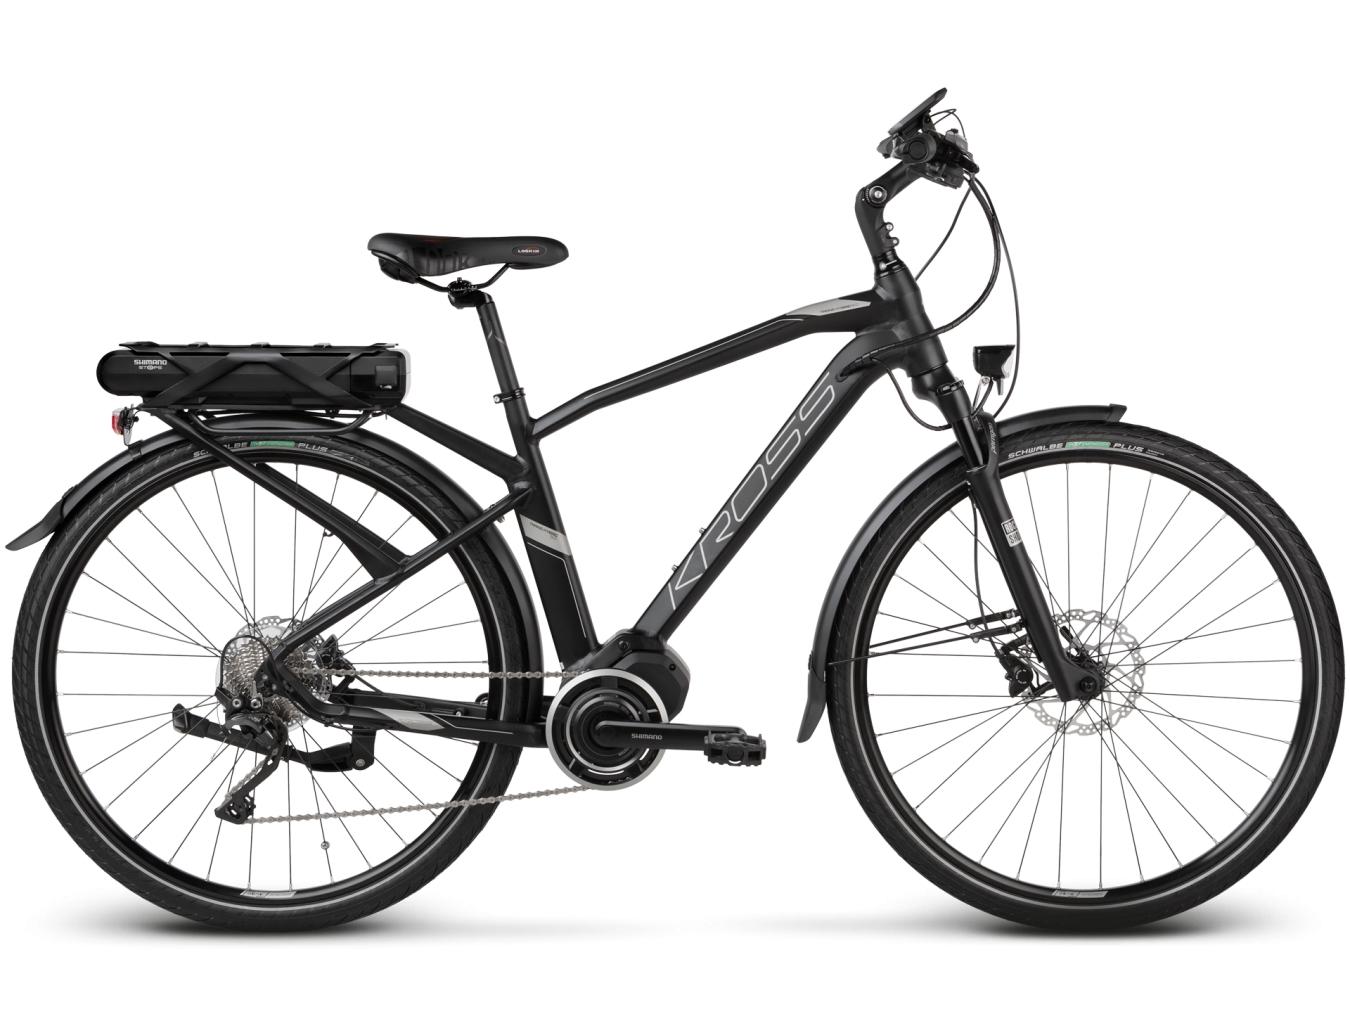 rower trans hybrid 5 0 rowery elektryczne ebike kross. Black Bedroom Furniture Sets. Home Design Ideas